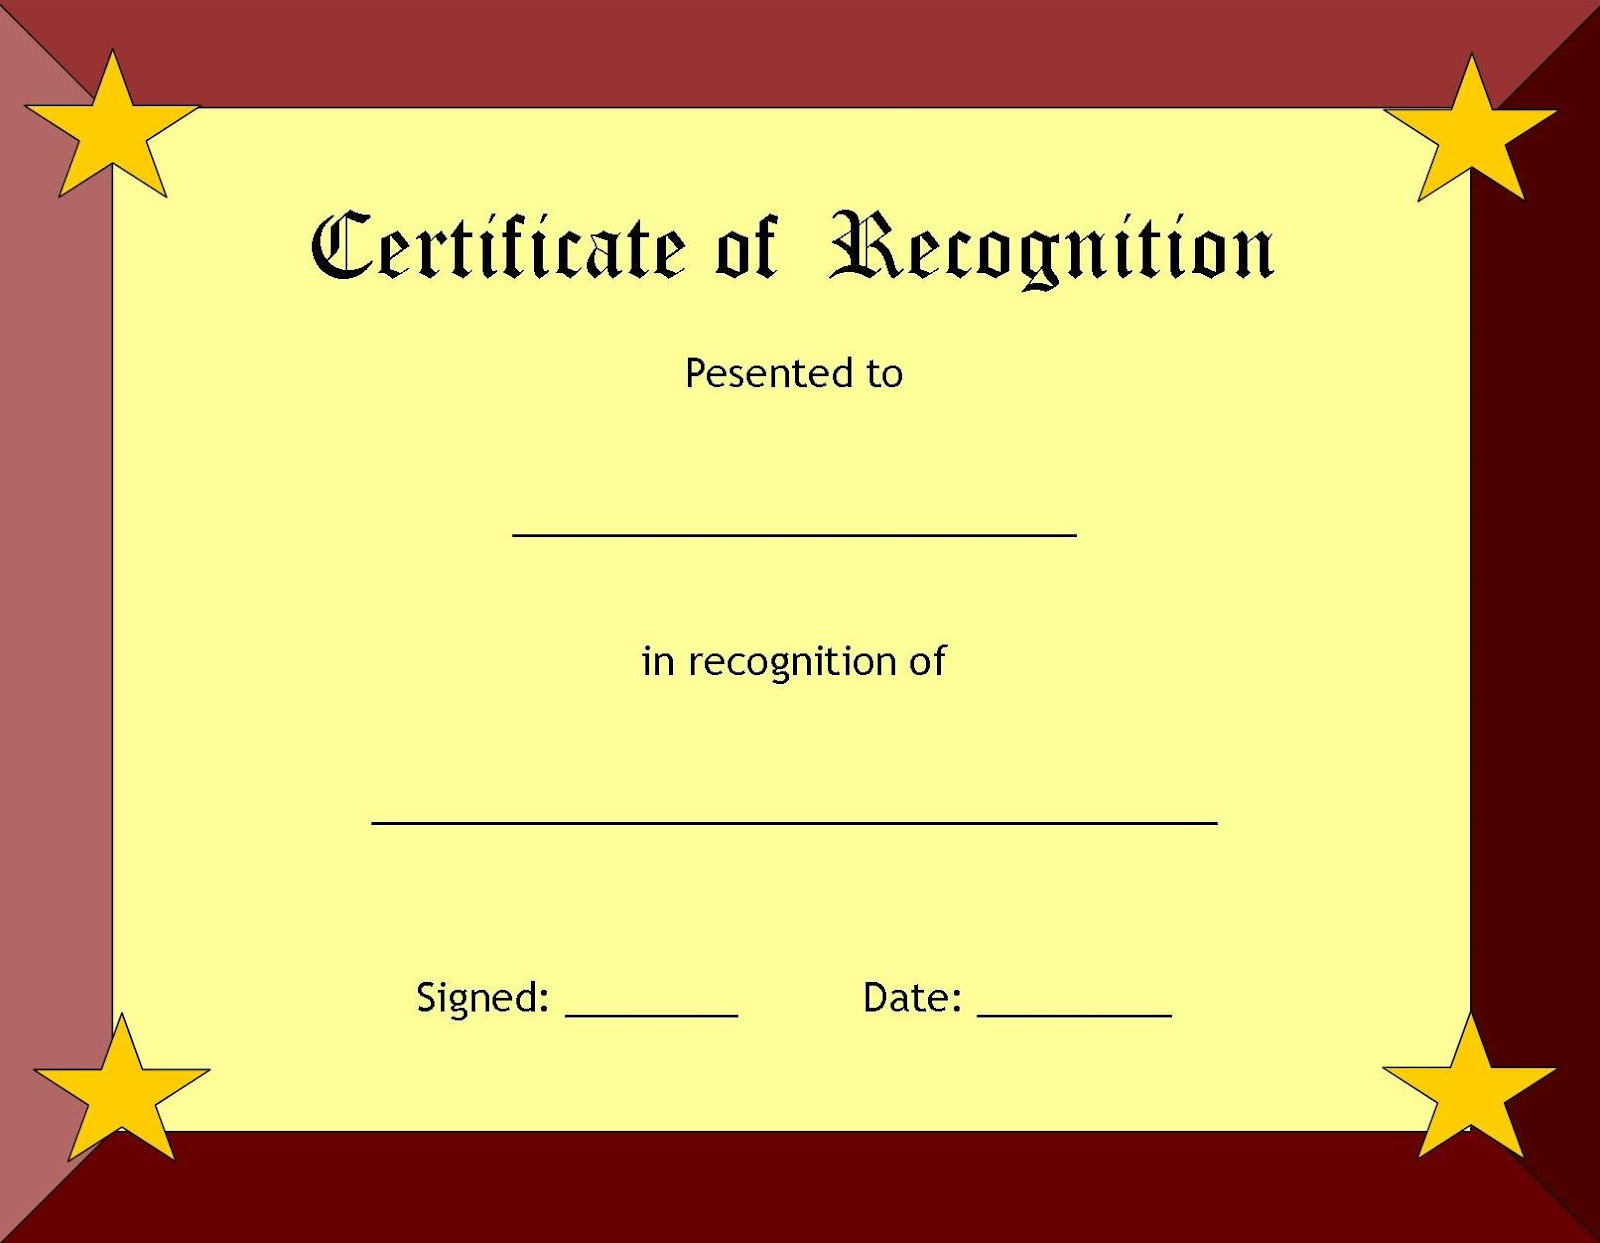 Microsoft Office Certificate Format teacher job resume format – Microsoft Office Certificate Template